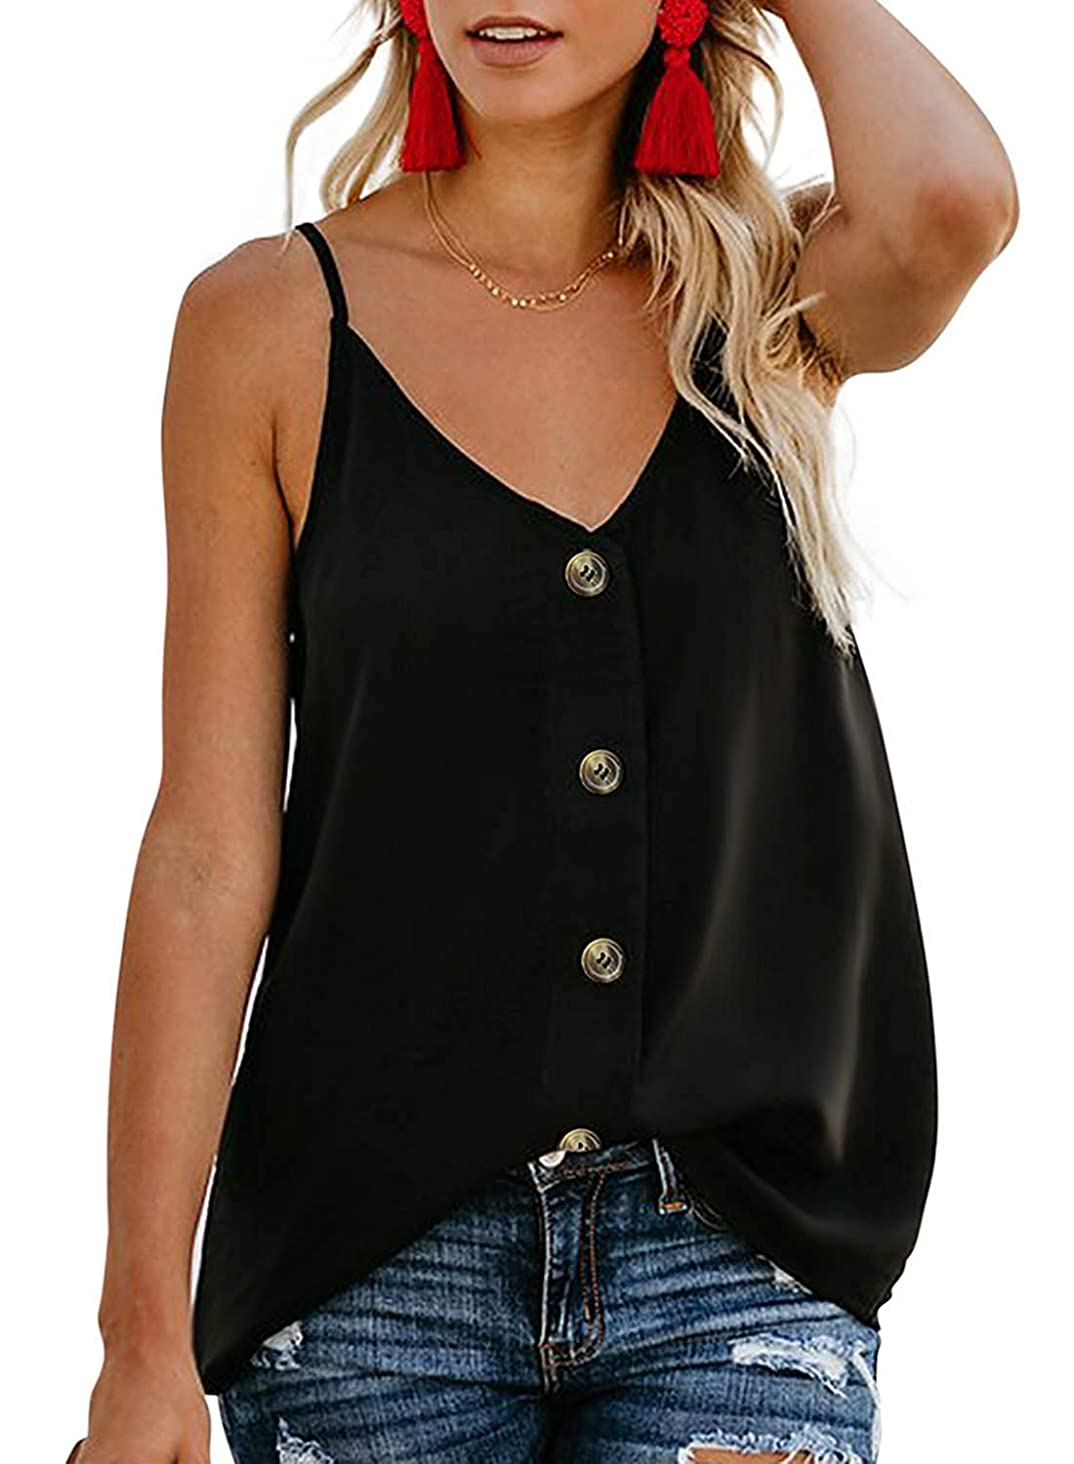 Sousuoty Women's Summer Deep V Neck Shirts Button Down Spaghetti Strap Tank Tops